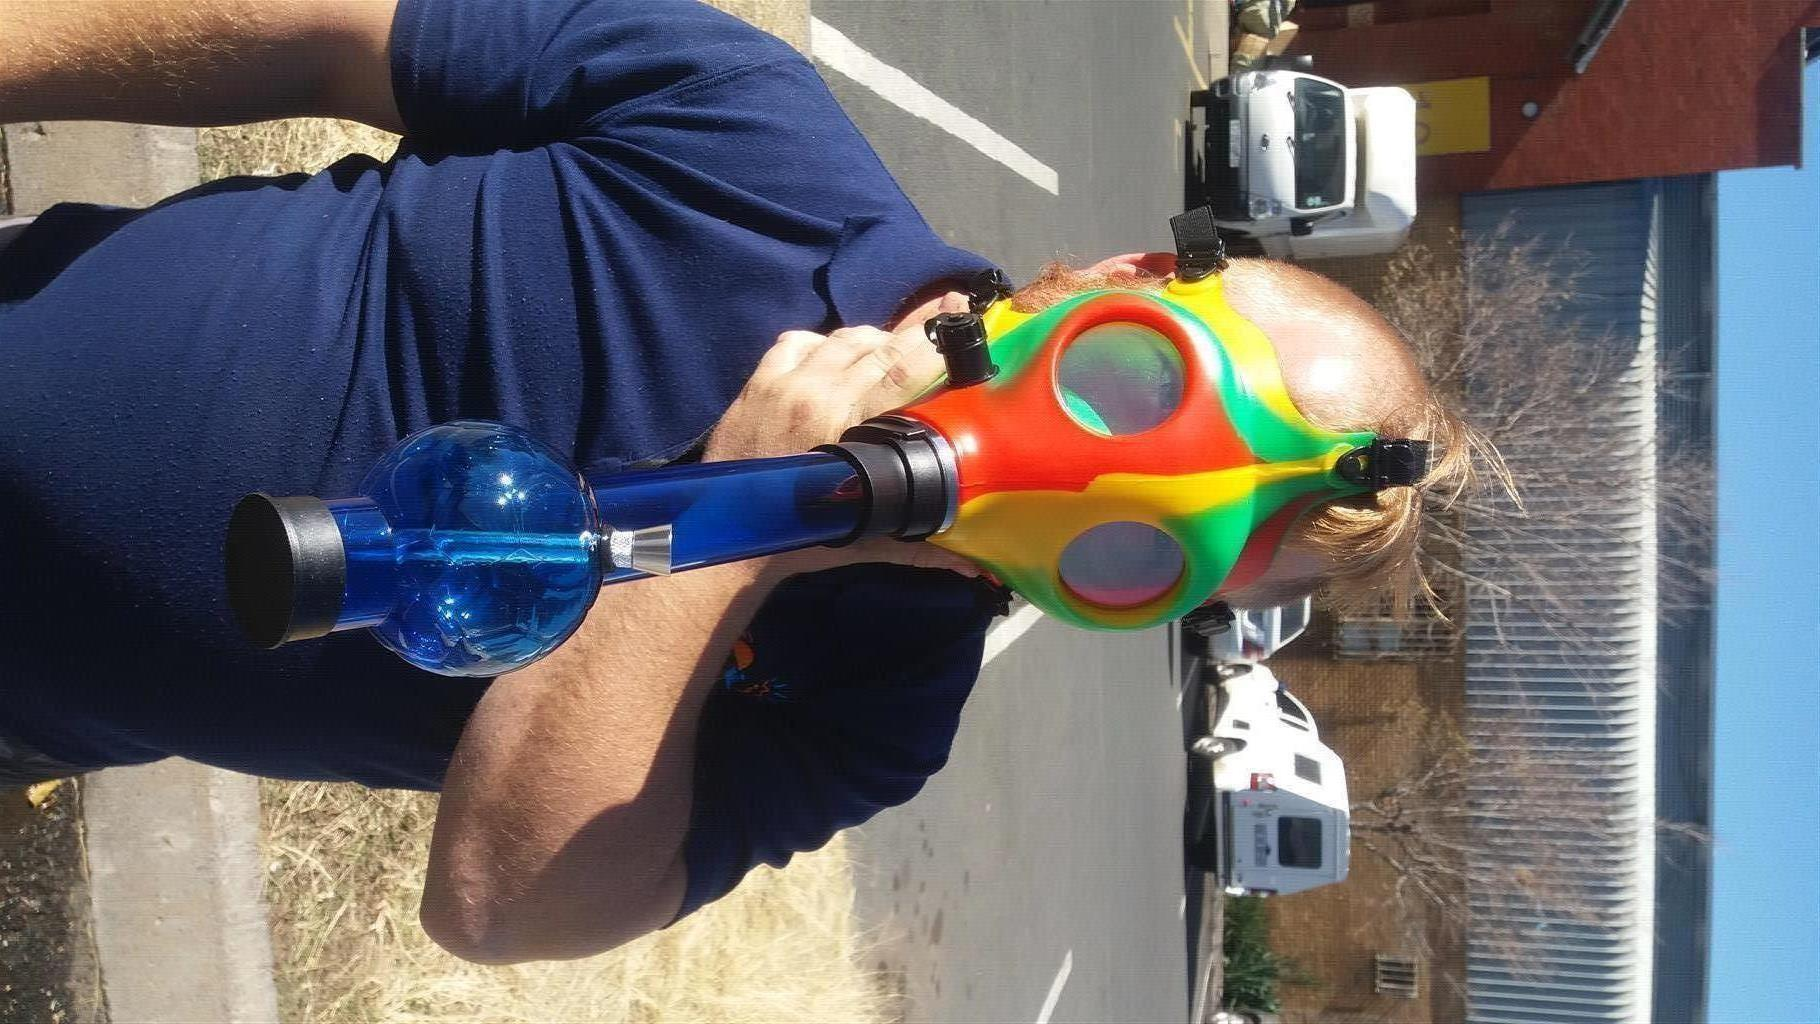 Comical gas masks